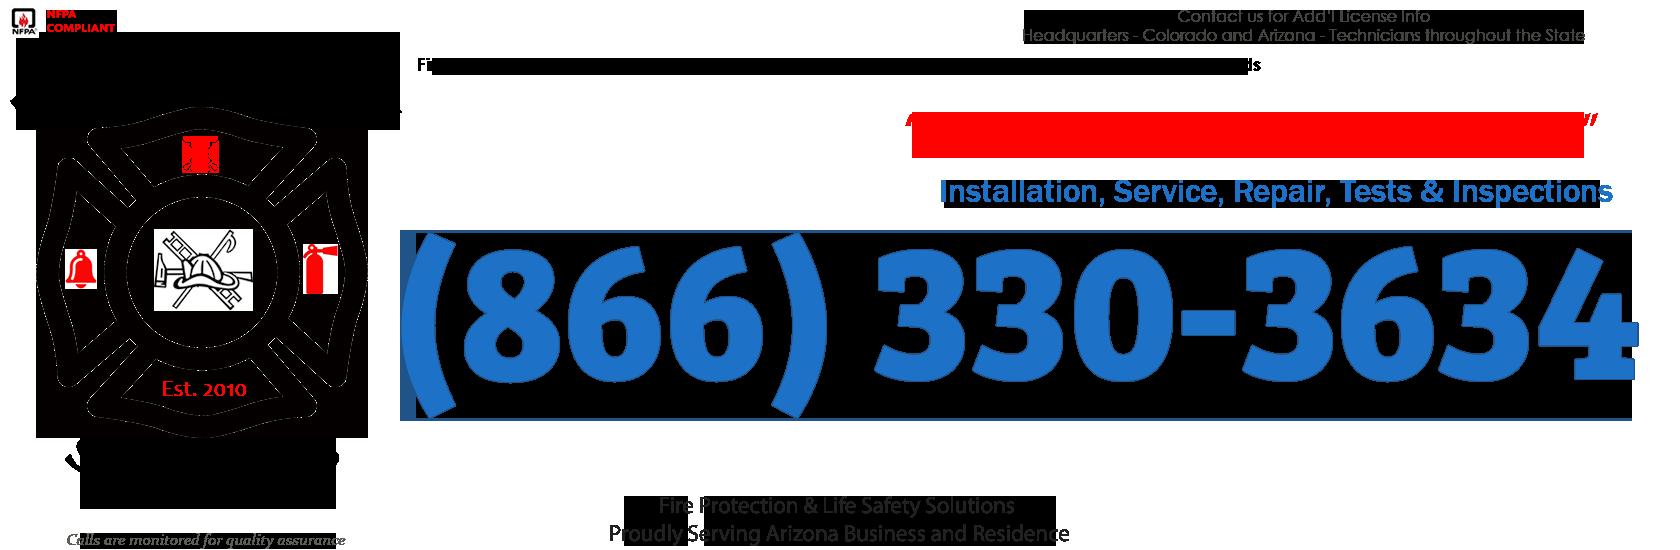 Flagstaff, Arizona Fire Sprinkler Service Company